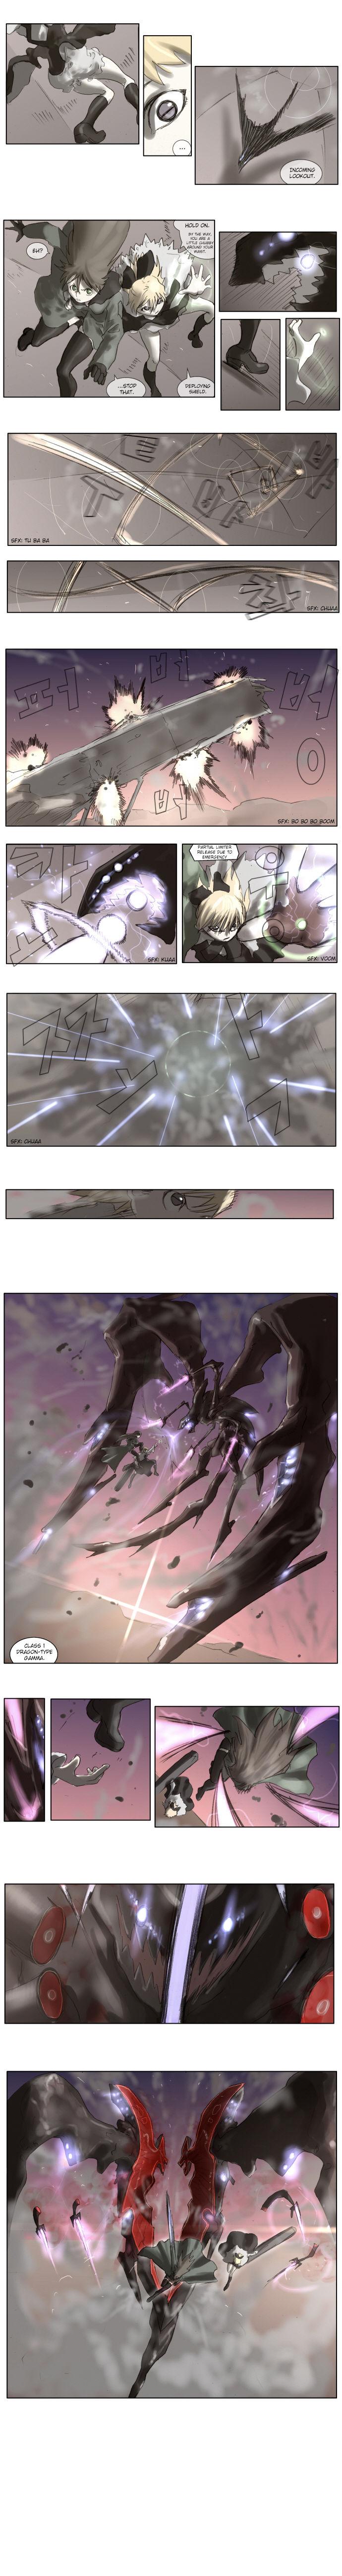 Knight Run 48 Page 1